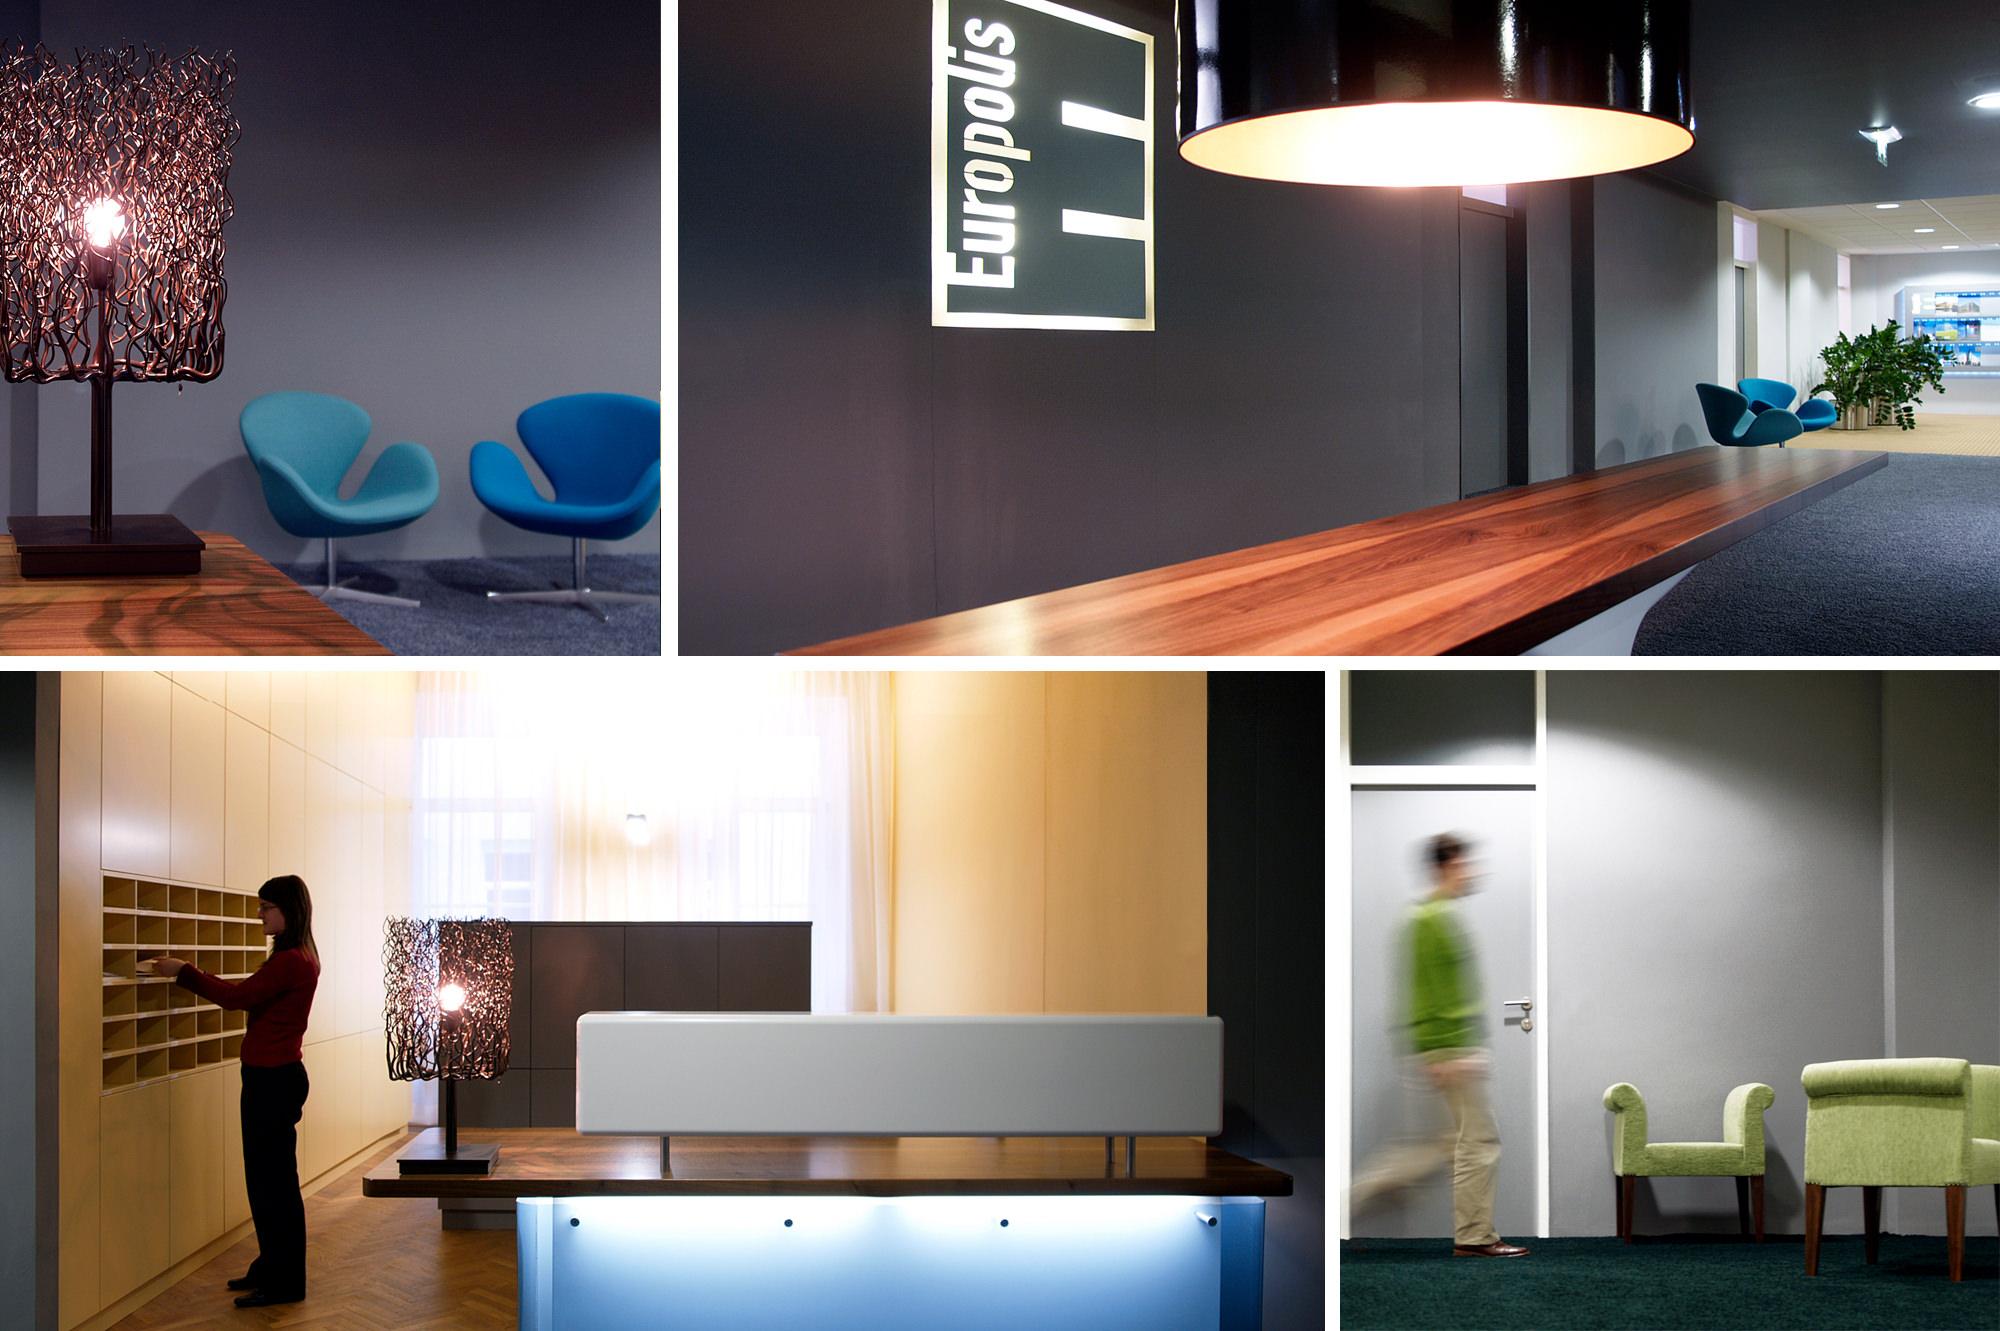 europolis_headquarter_01_umbau_buerogebaeude_1010_wien_junger_beer_architektur